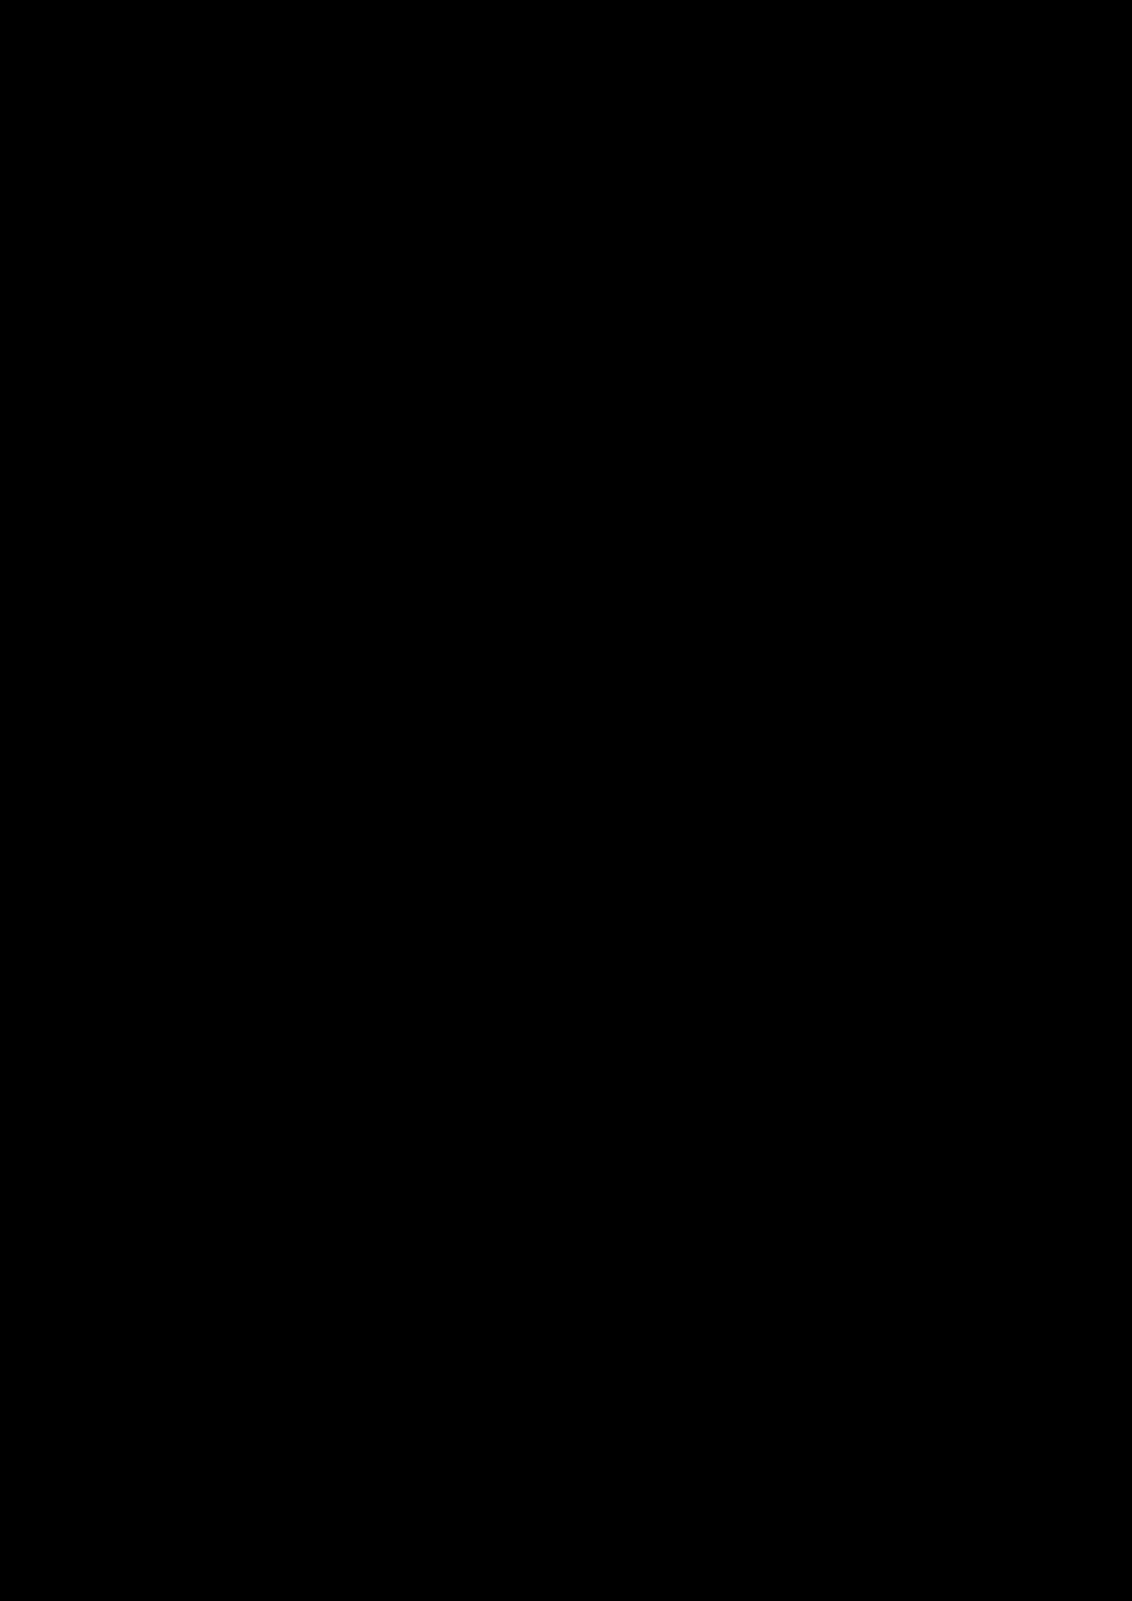 Belyiy sokol slide, Image 139